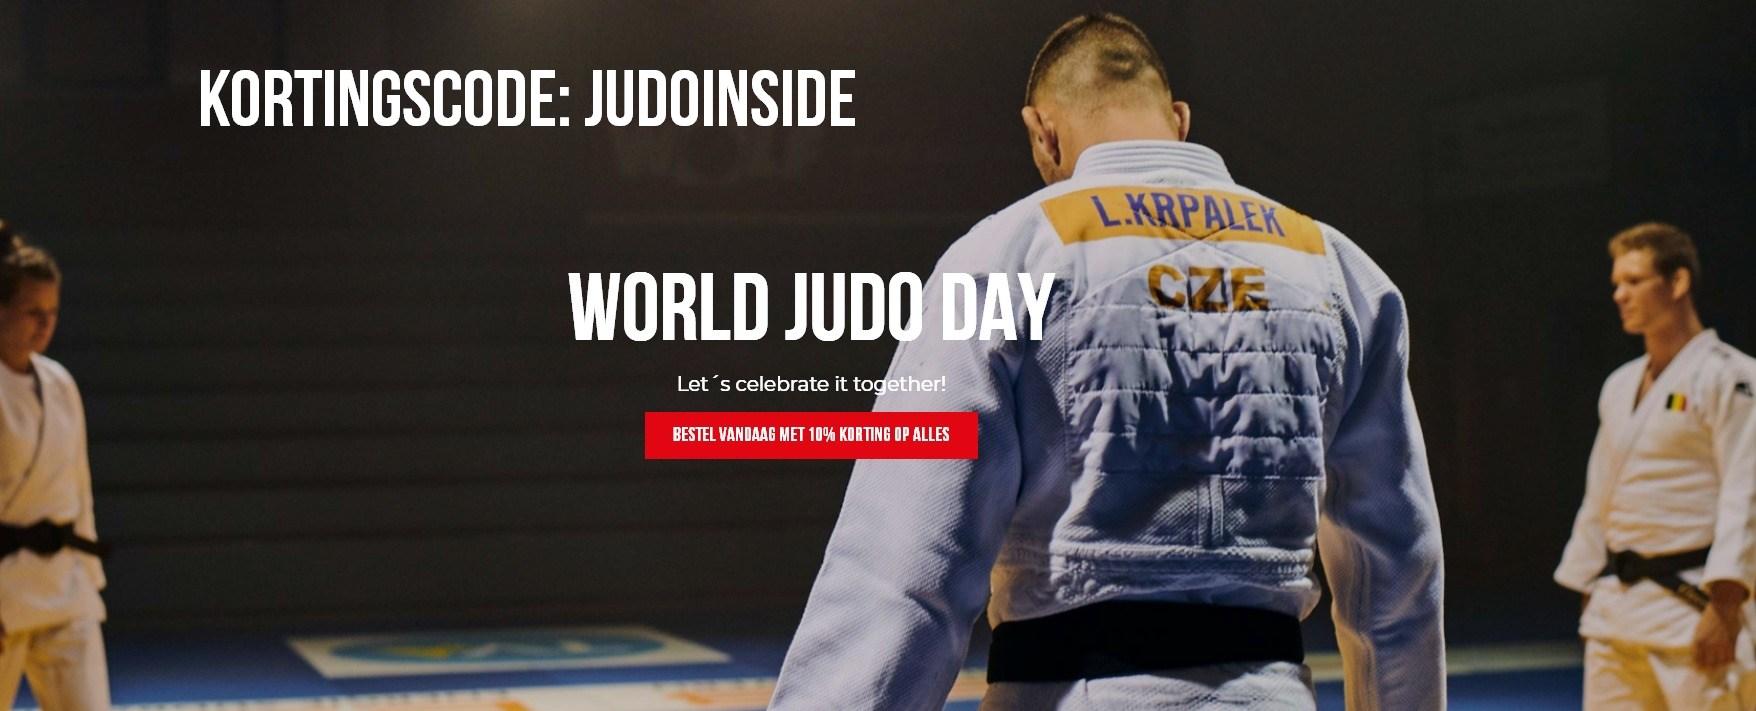 Judopak kopen op World Judo Day